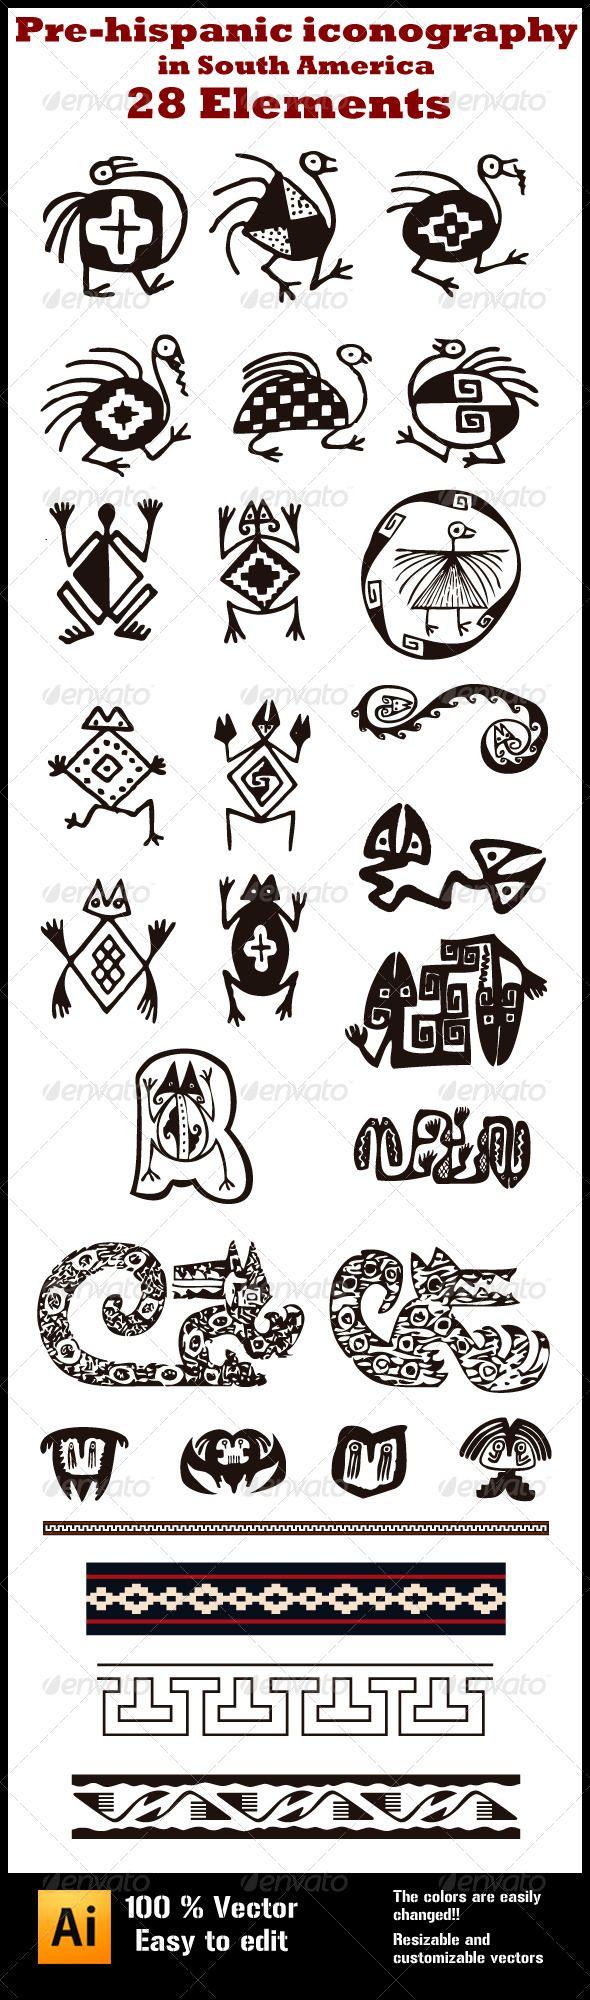 Pre hispanic iconography in south america south america symbols pre hispanic iconography in south america buycottarizona